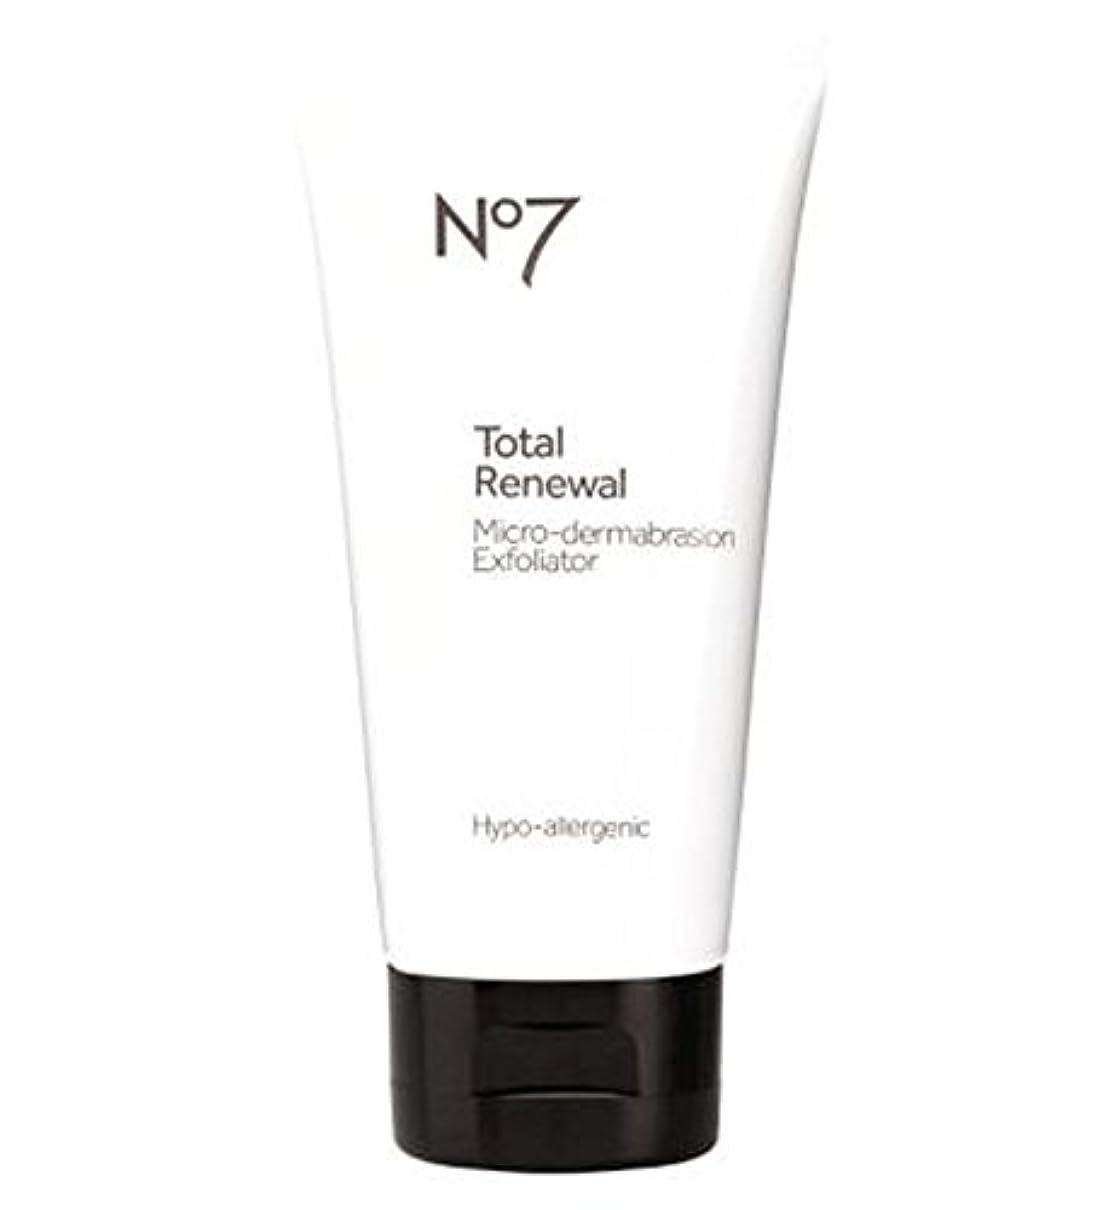 No7 Total Renewal Micro-dermabrasion Face Exfoliator - No7総リニューアルマイクロ皮膚剥離面エクスフォリエーター (No7) [並行輸入品]